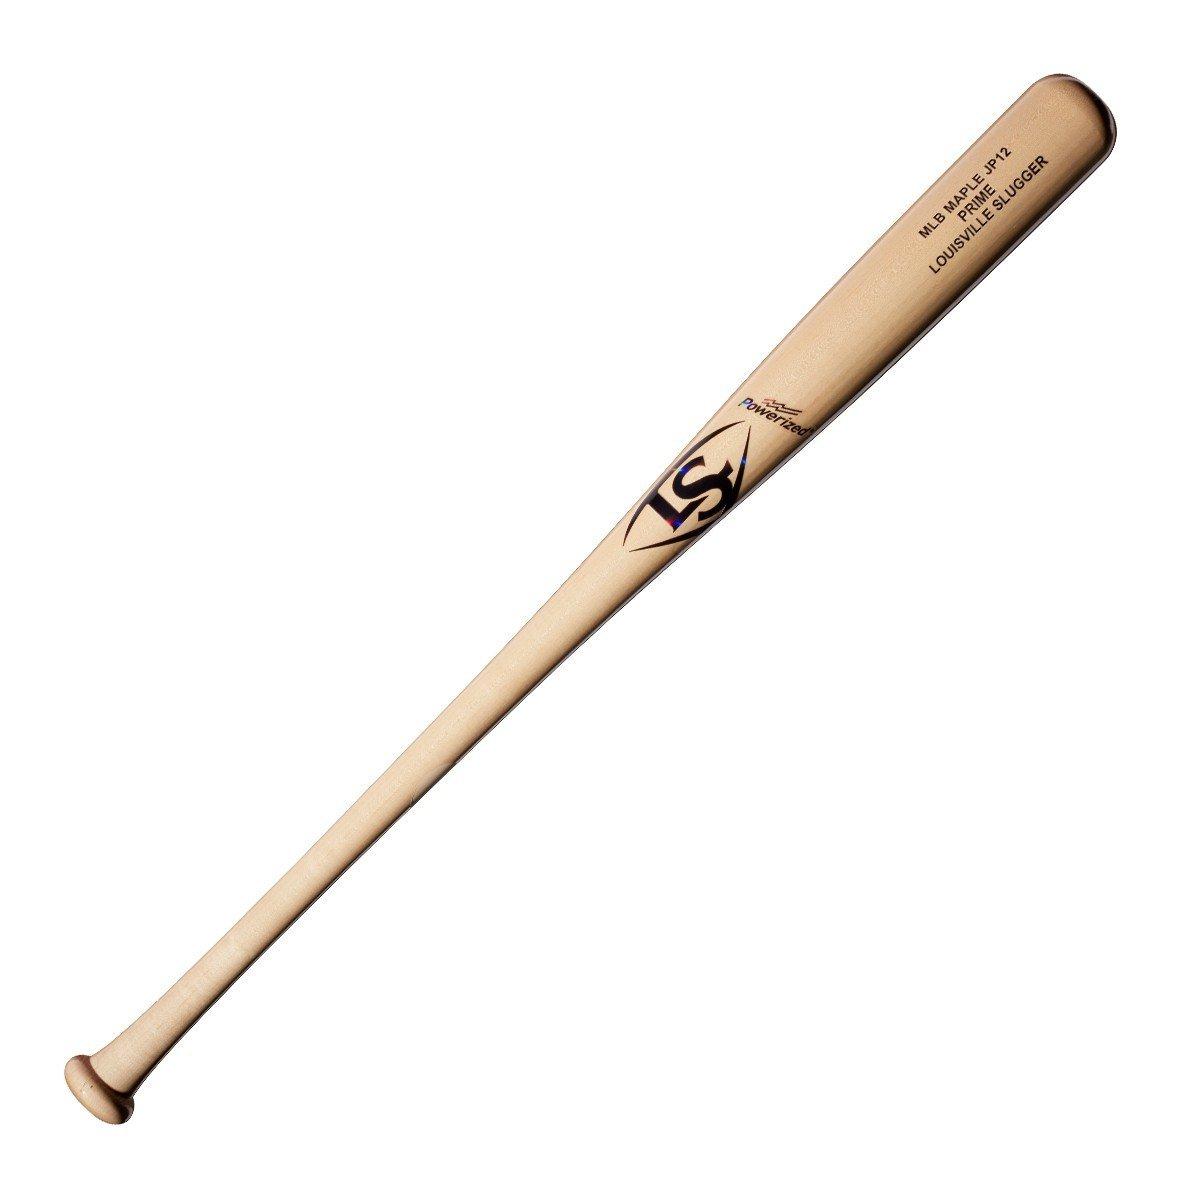 MLB Prime Maple JP12